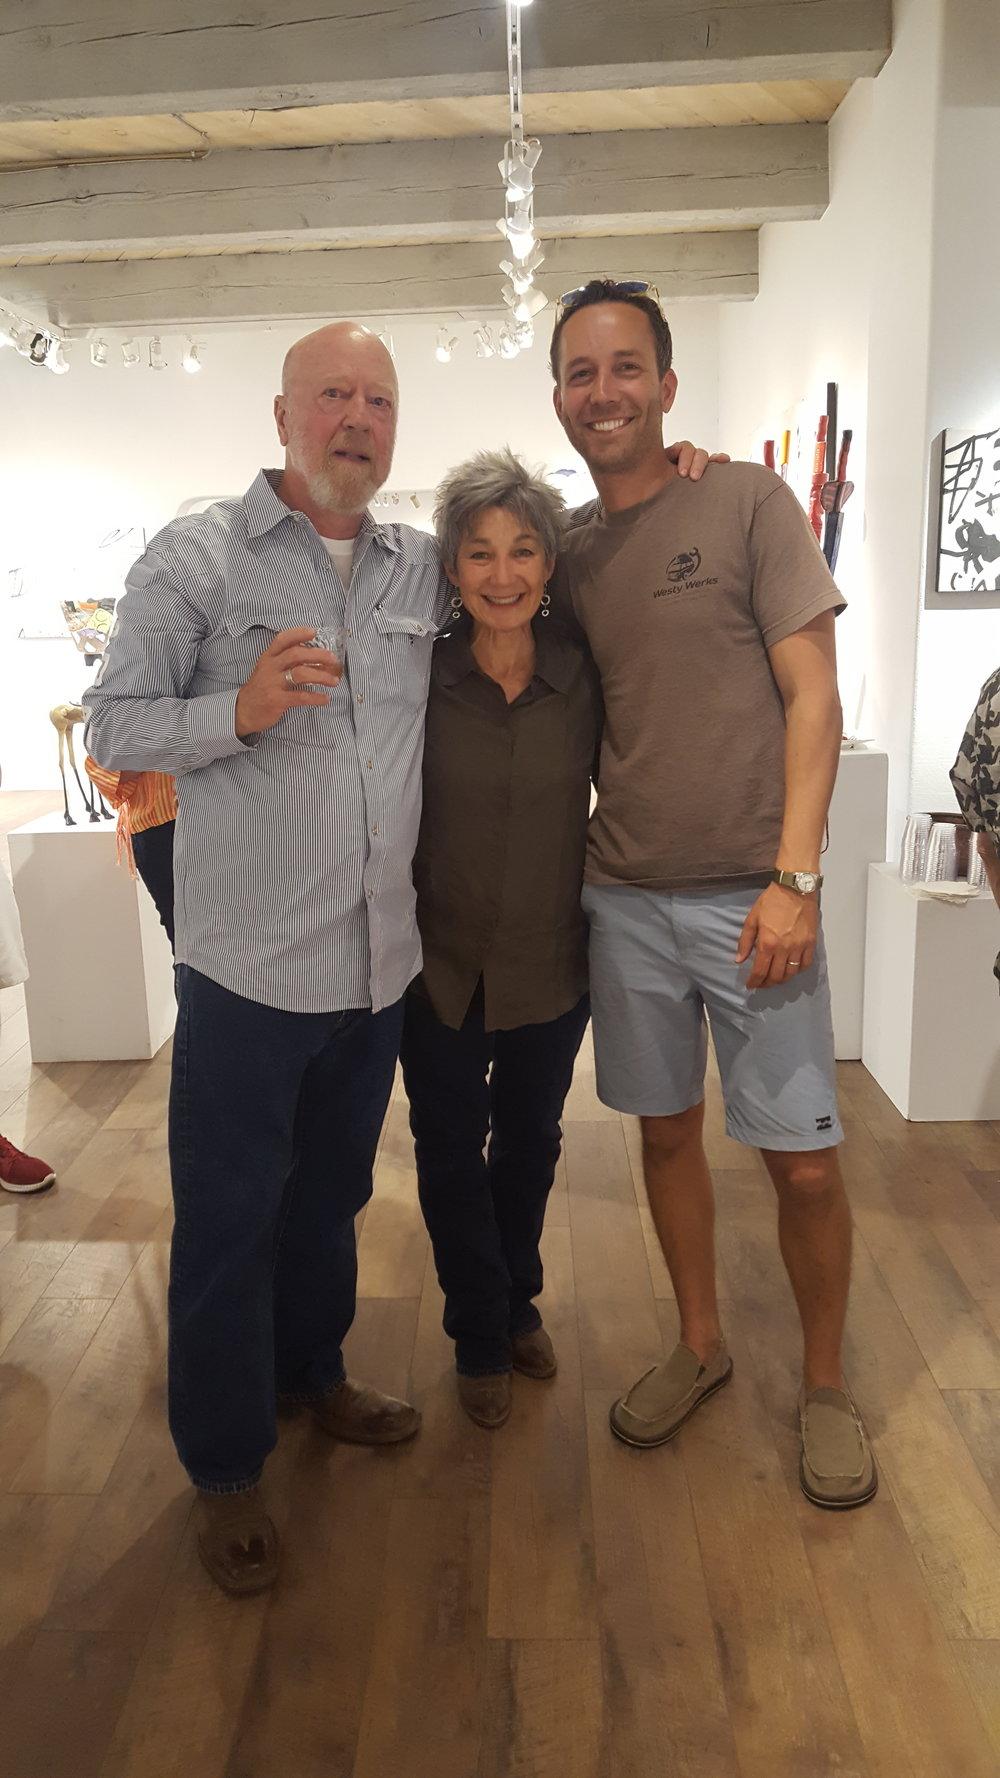 Greg Gummersall's art exhibit at Lanning Gallery, Sedona